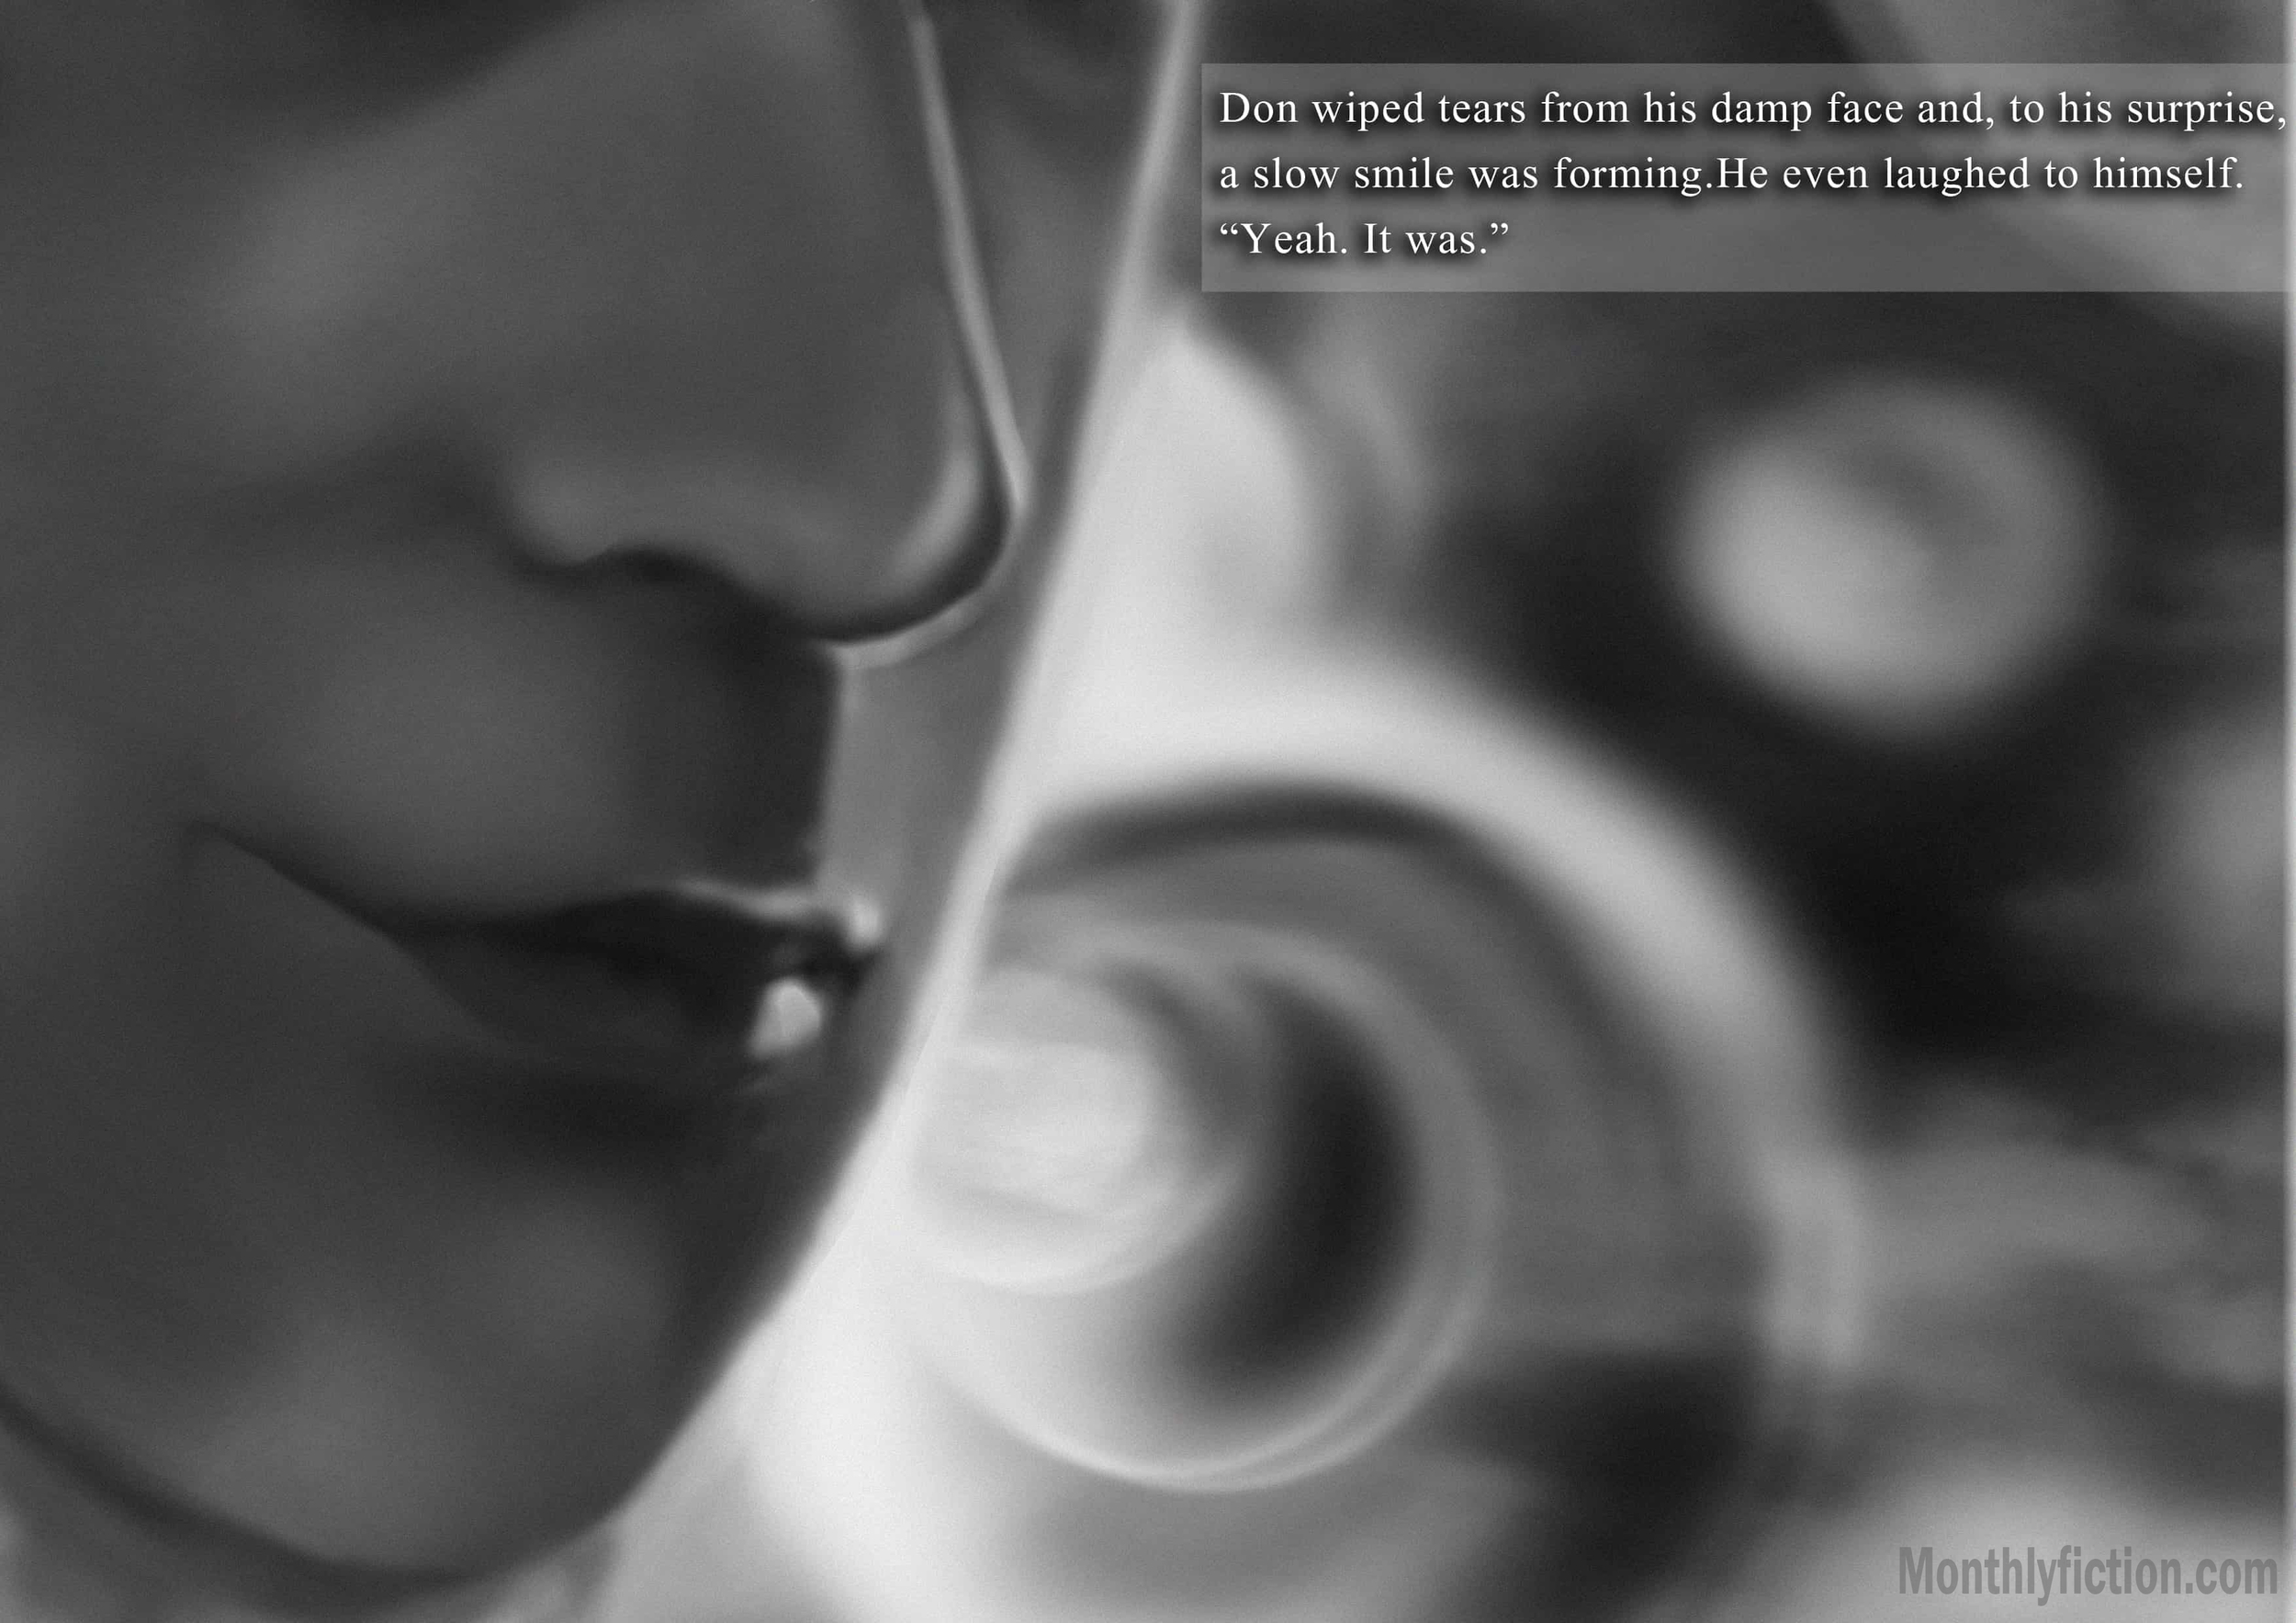 Monthly Fiction Amethyst illustration illustraded story stephanie weber ida softic page 21